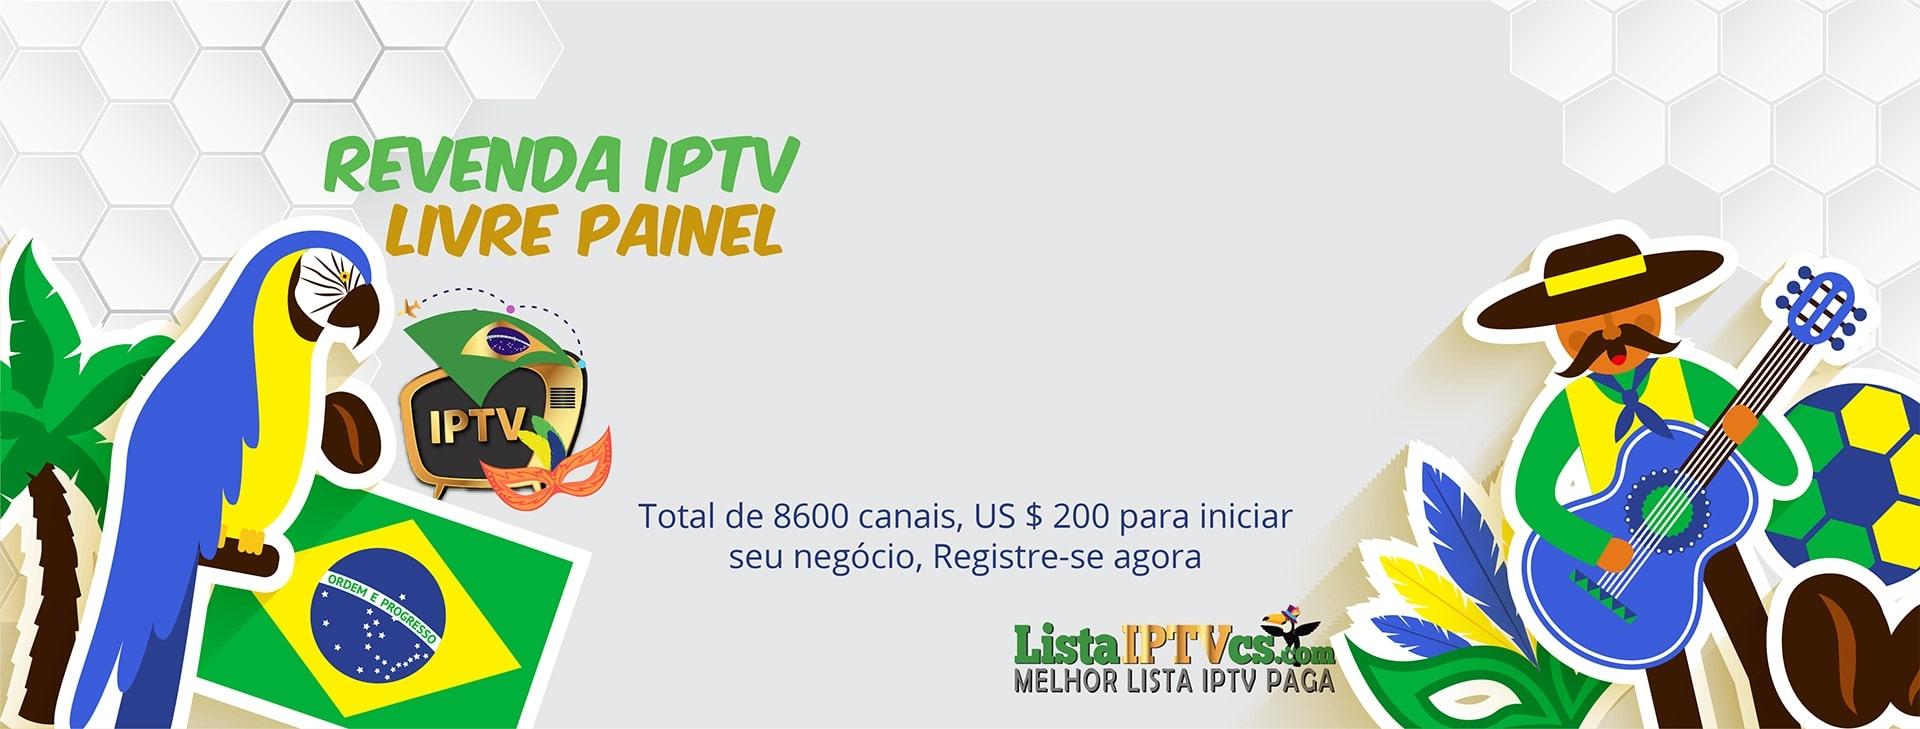 ListaIPTVcs01 (@listaiptvcs01) Cover Image